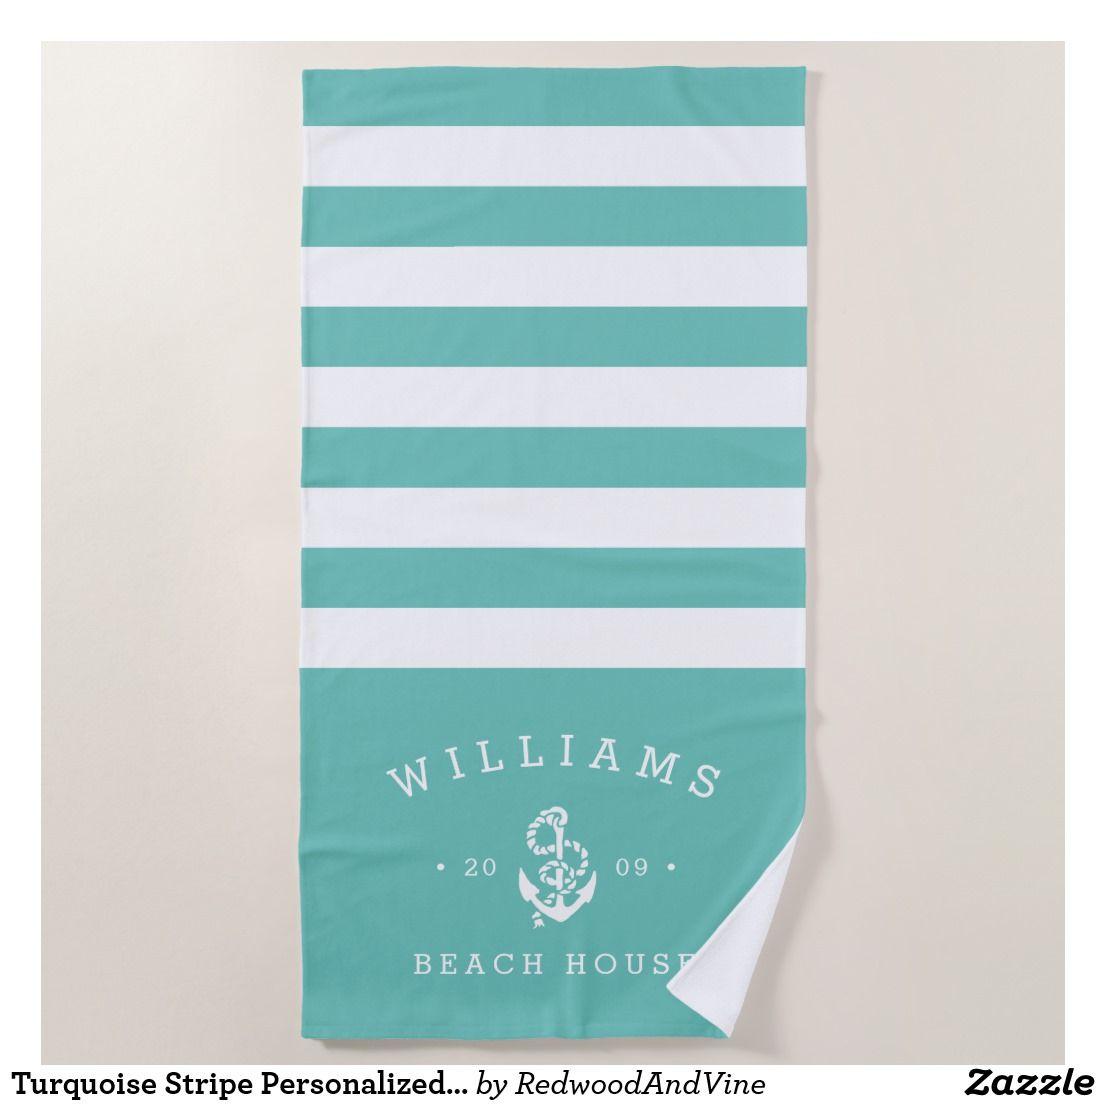 Turquoise Stripe Personalised Beach House Beach Towel Zazzle Co